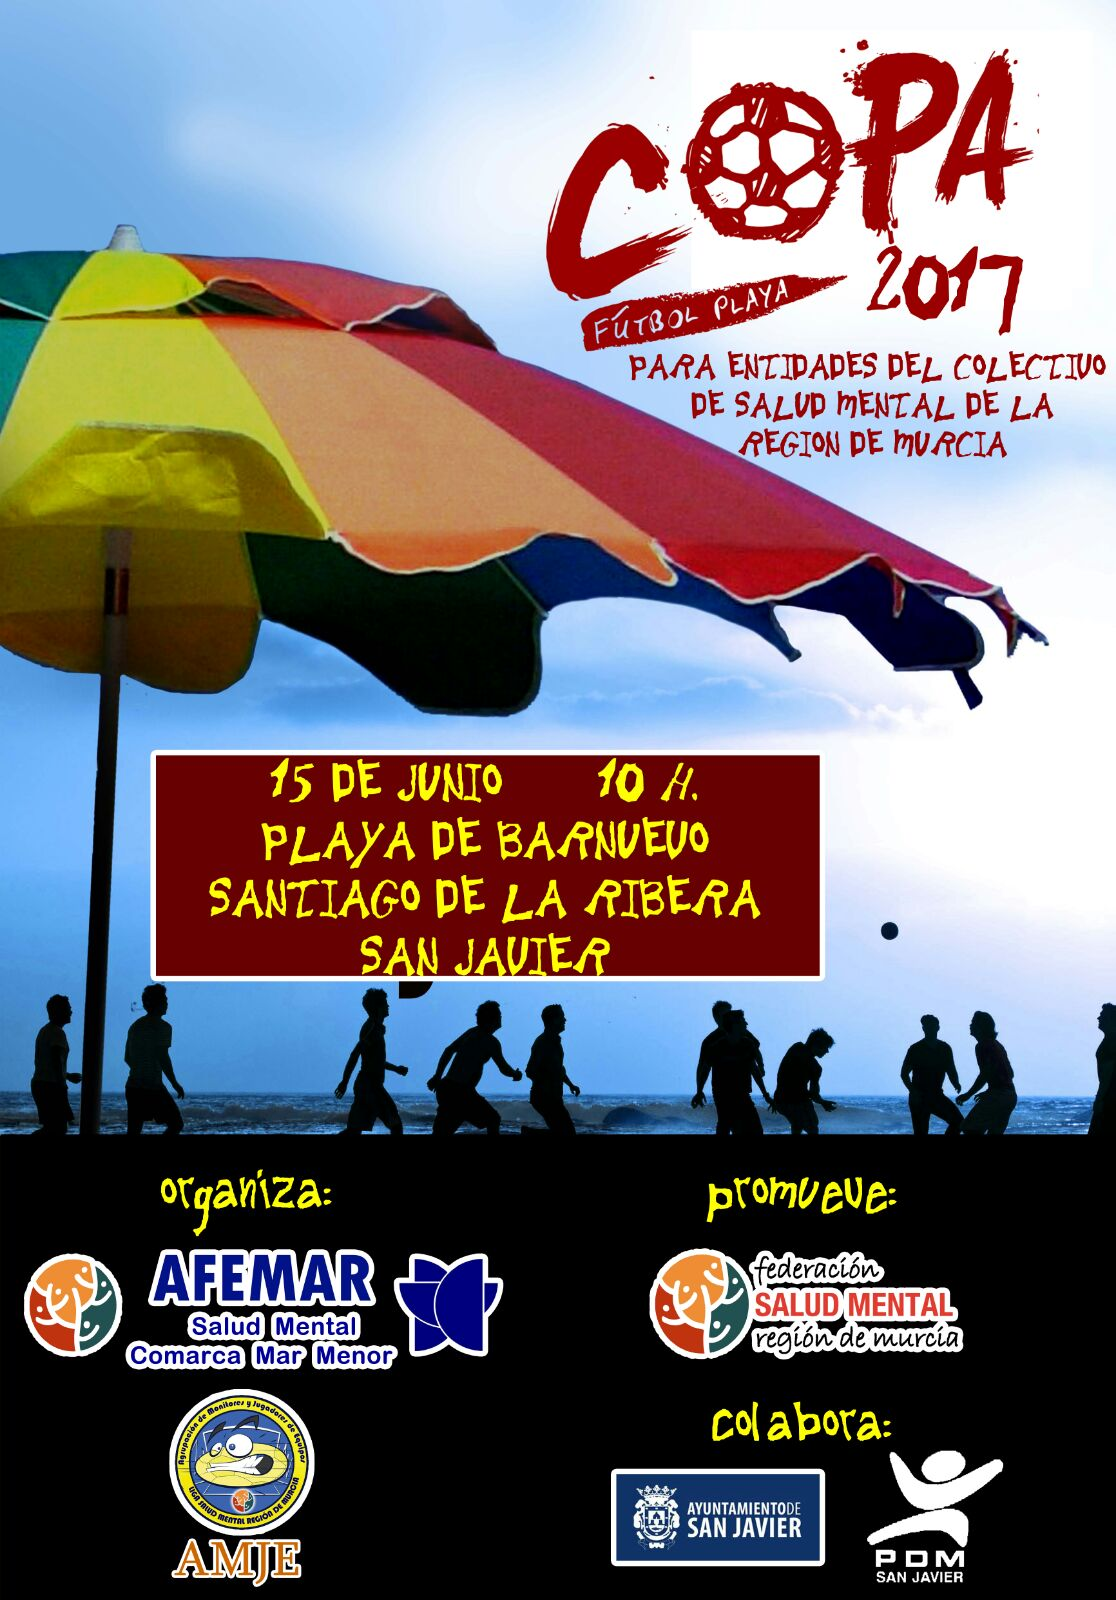 CARTEL DE LA COPA 2017